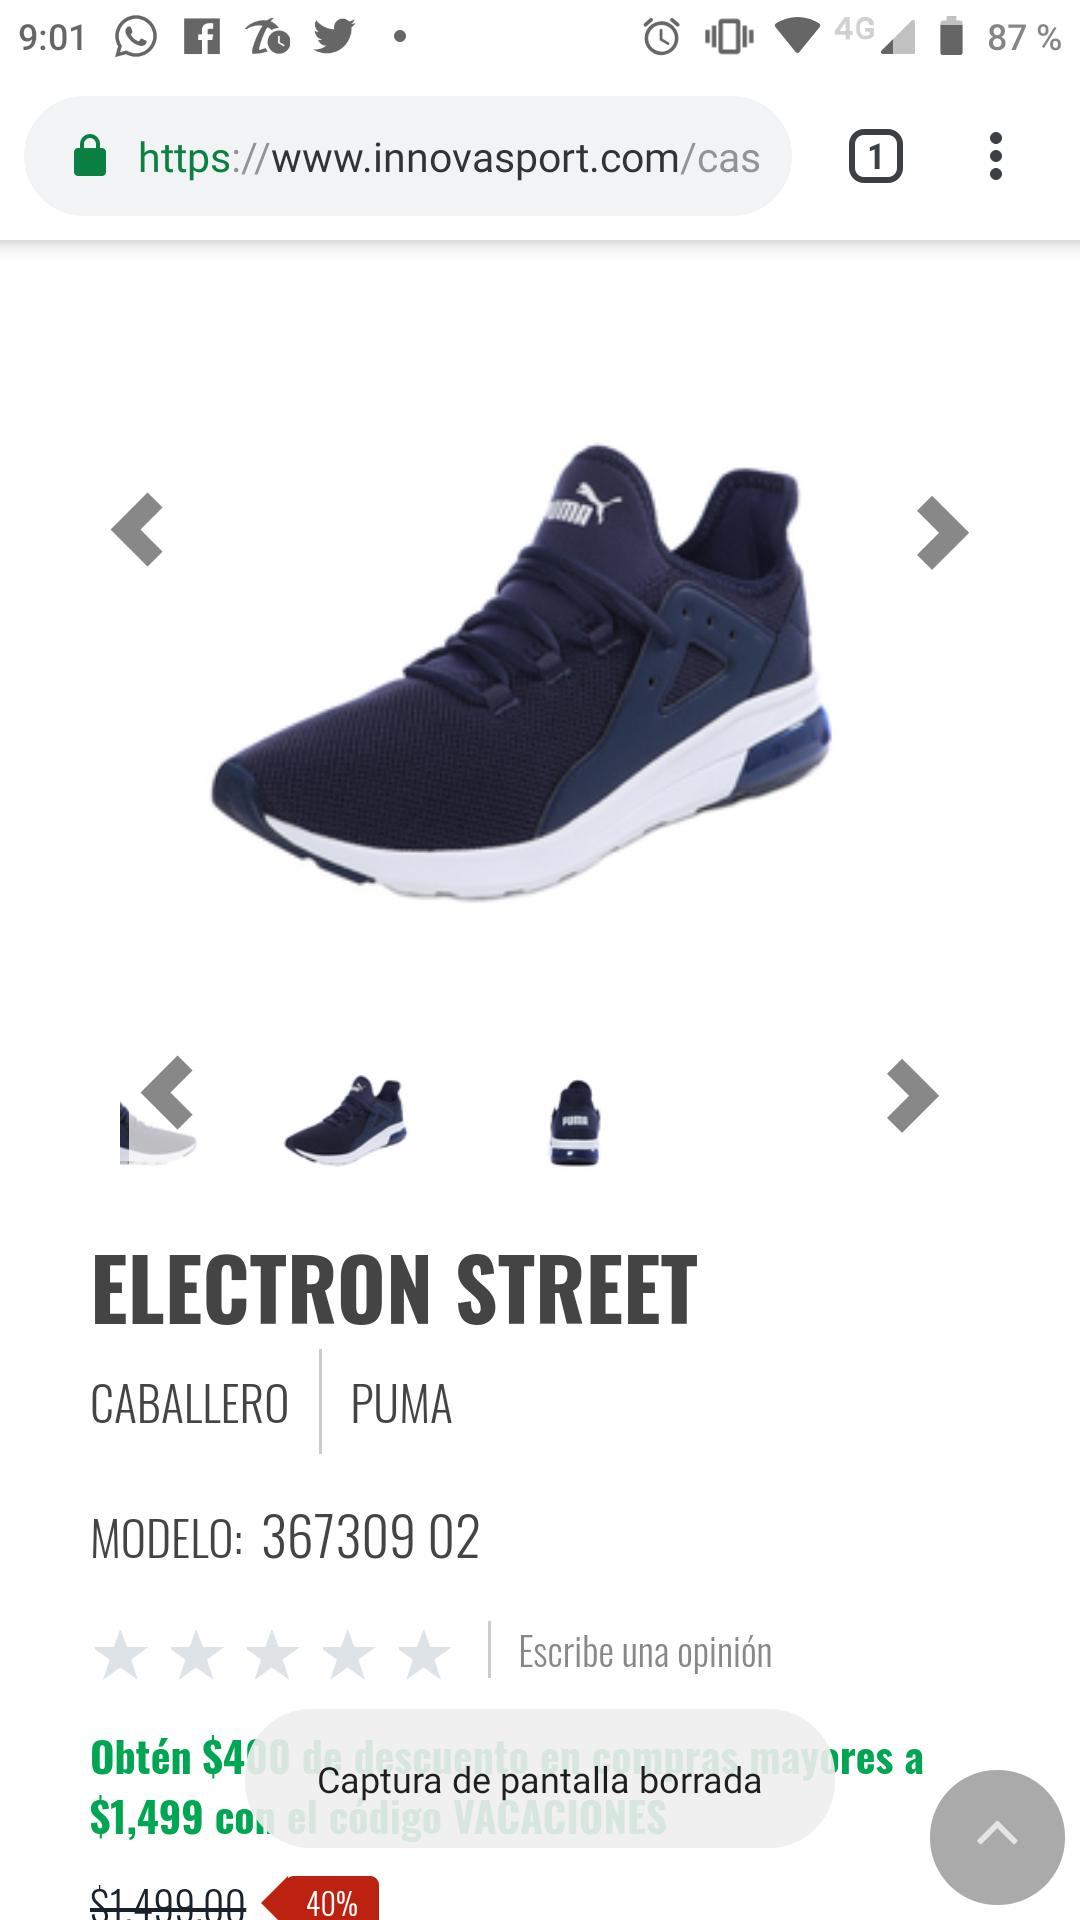 Innovasport: Tennis puma Electron Street